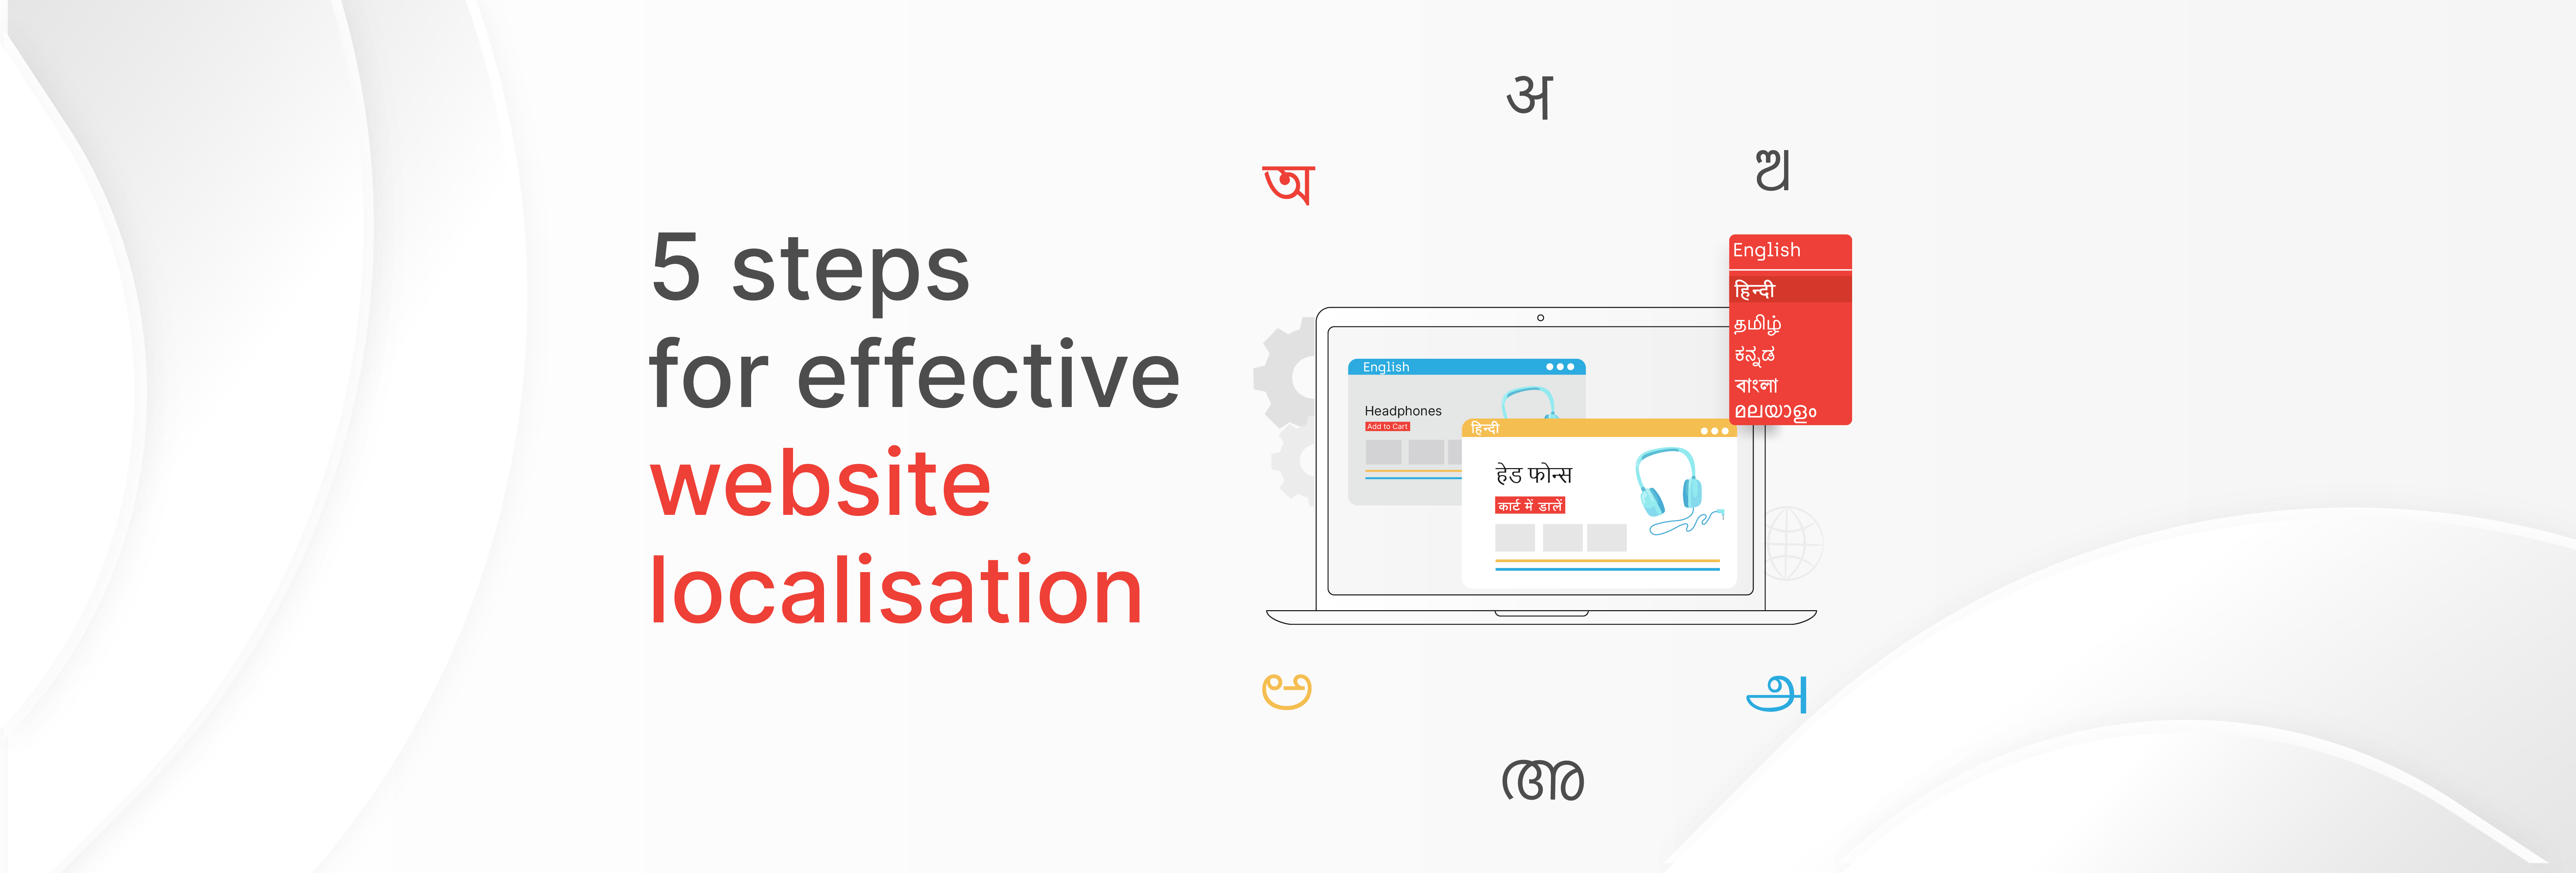 website localization steps